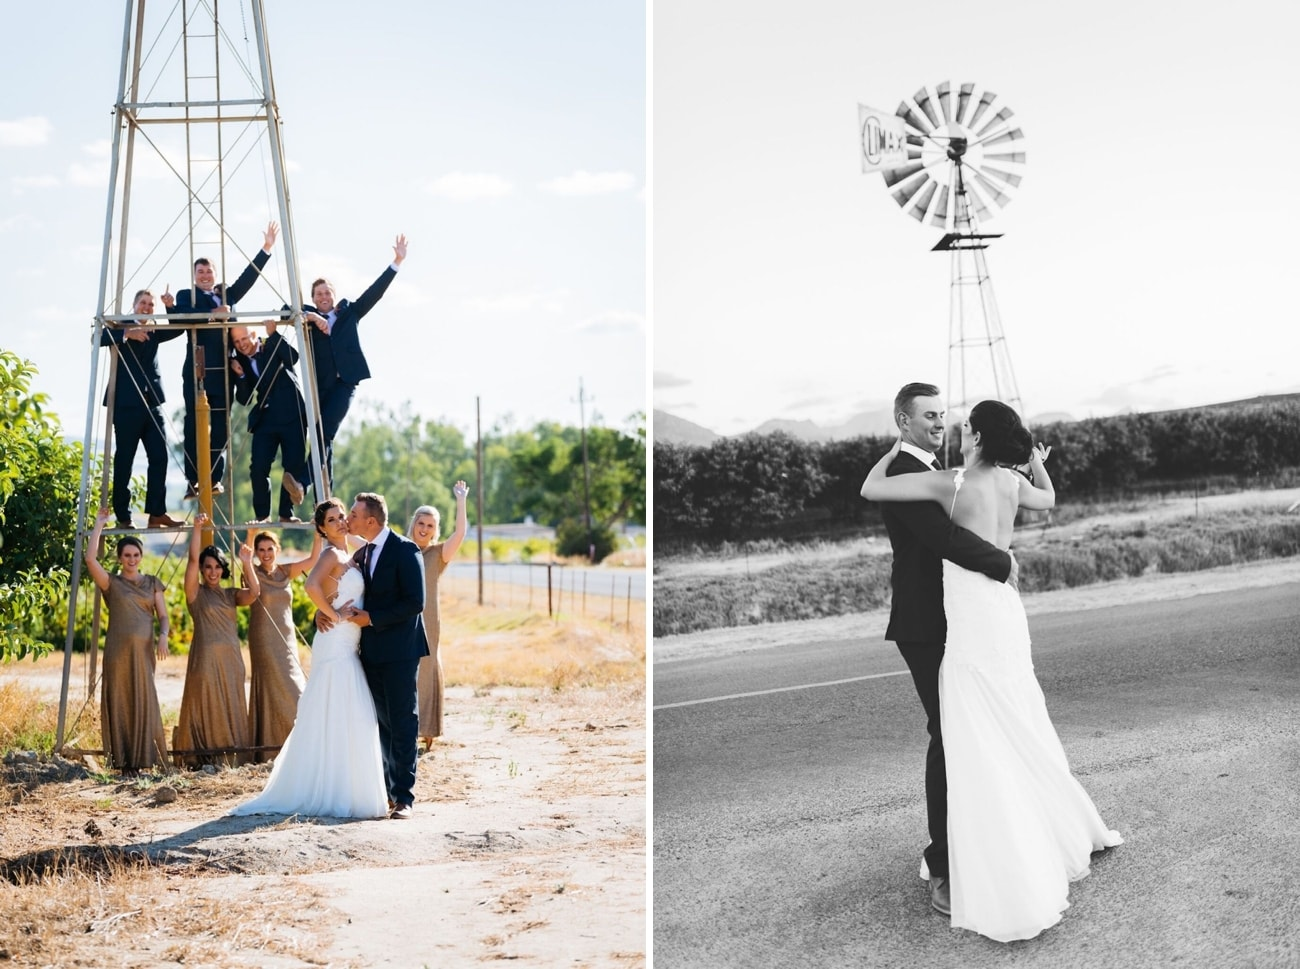 South African farm wedding | Credit: Matthew Carr